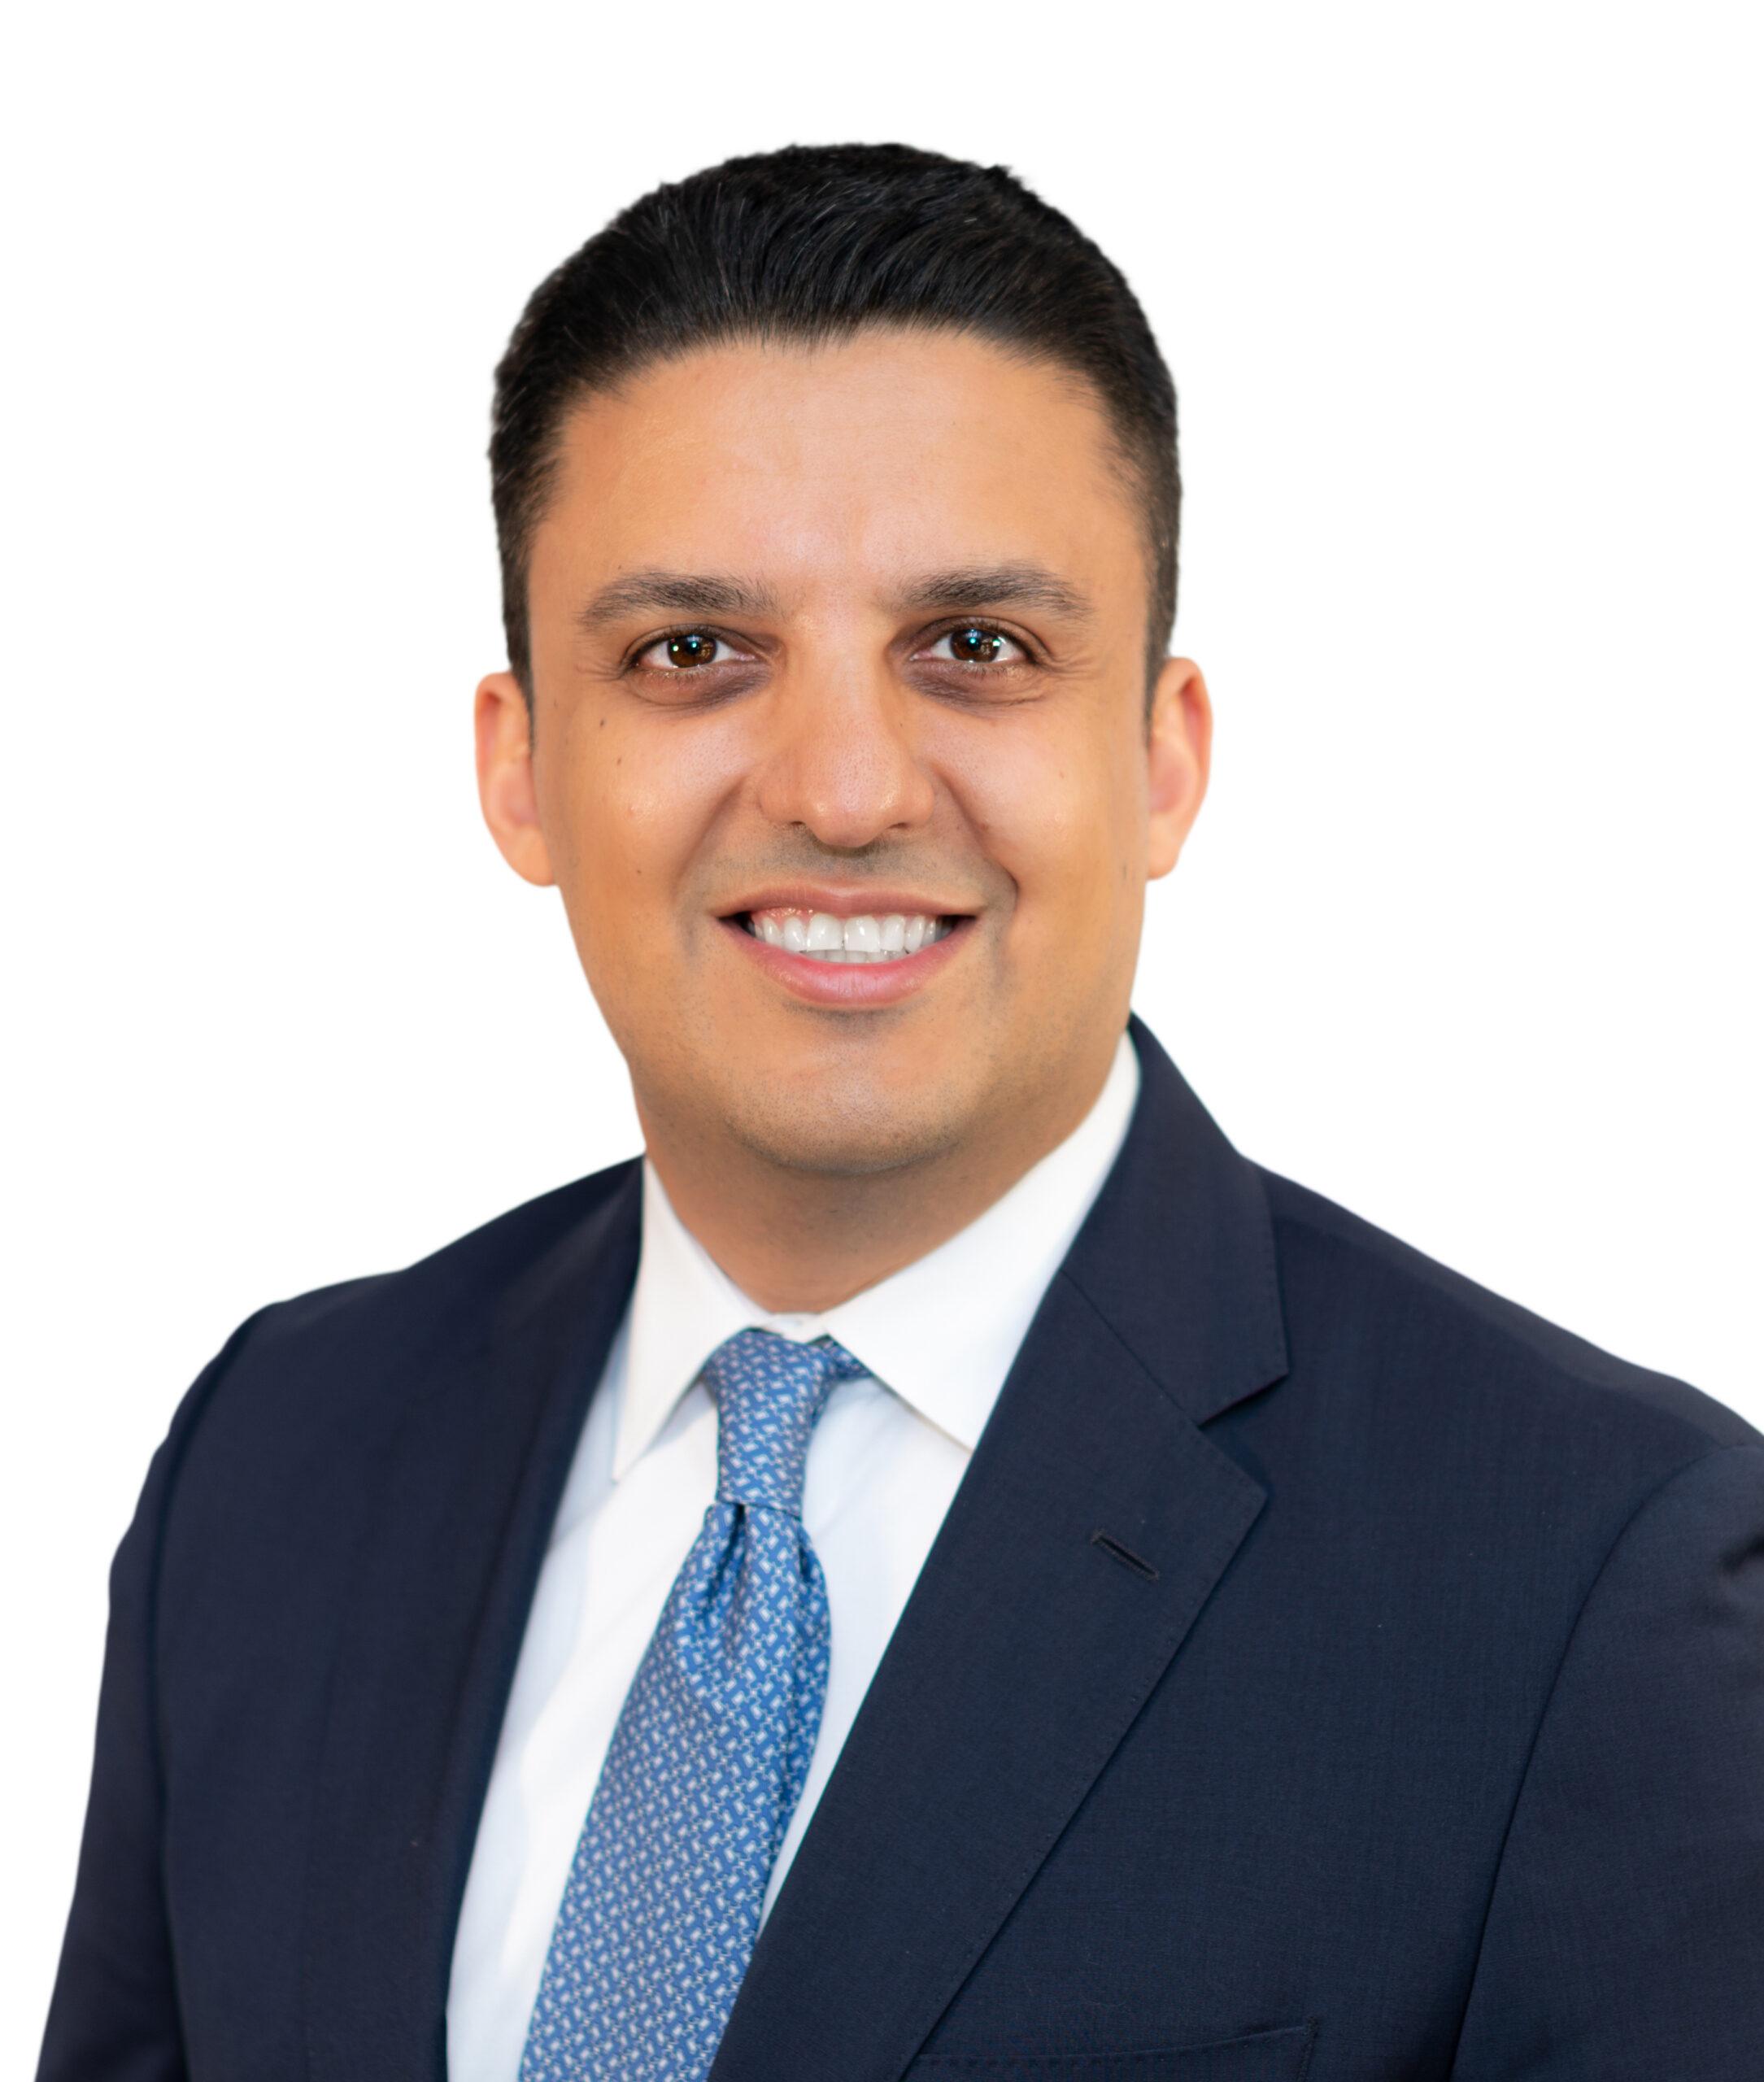 Farhad R. Alavi - Akrivis Law Group, PLLC